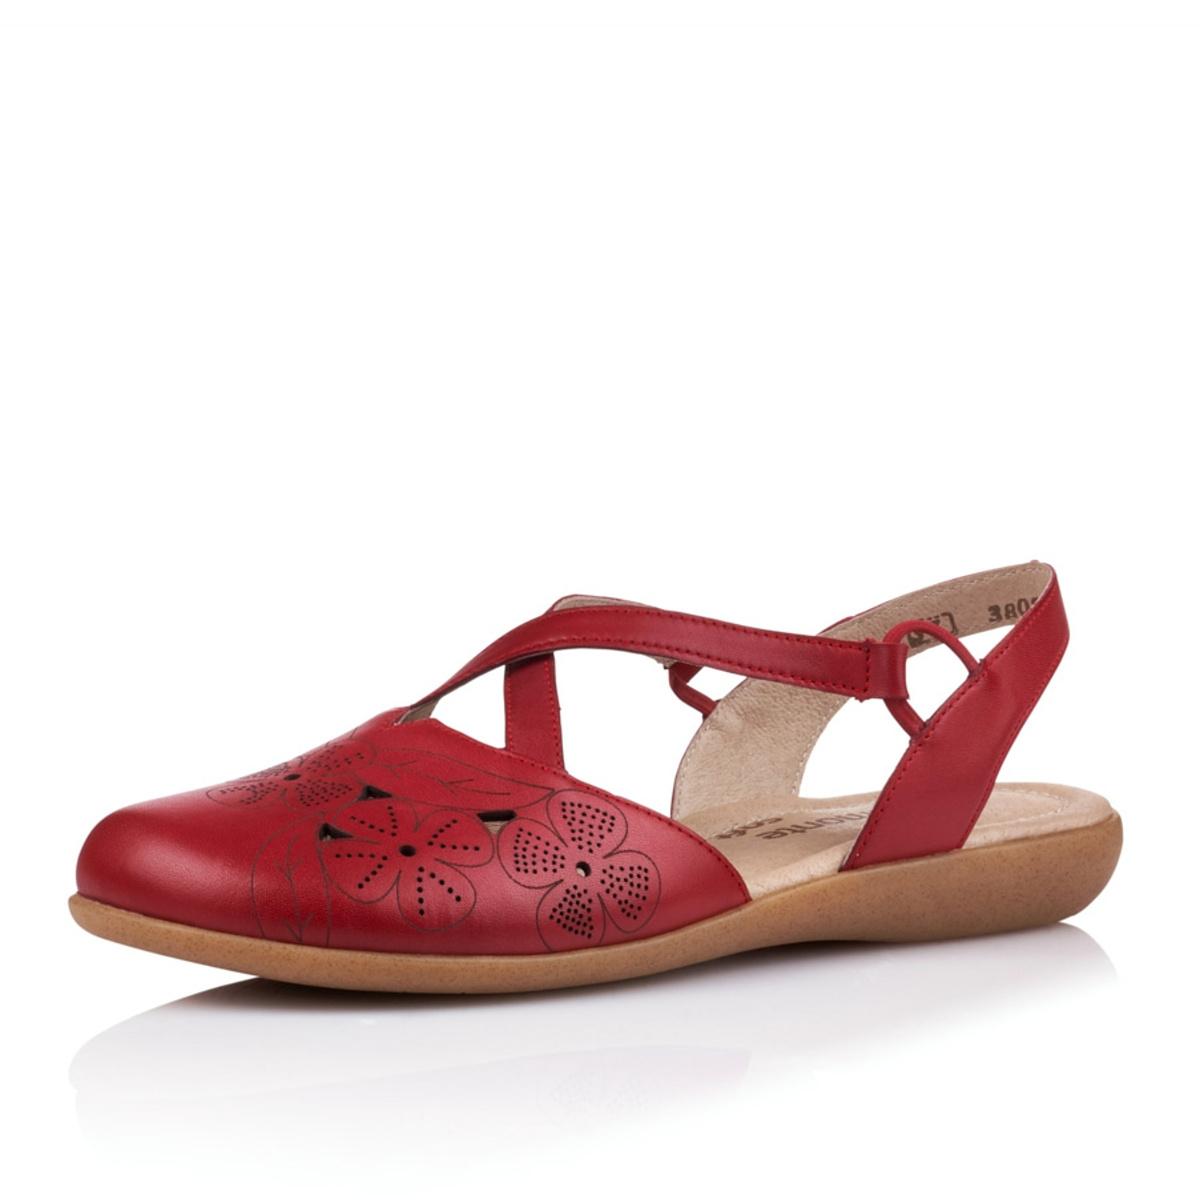 edba9aa574c2 detail Dámská obuv RIEKER - REMONTE br R3802-33 ROT F S